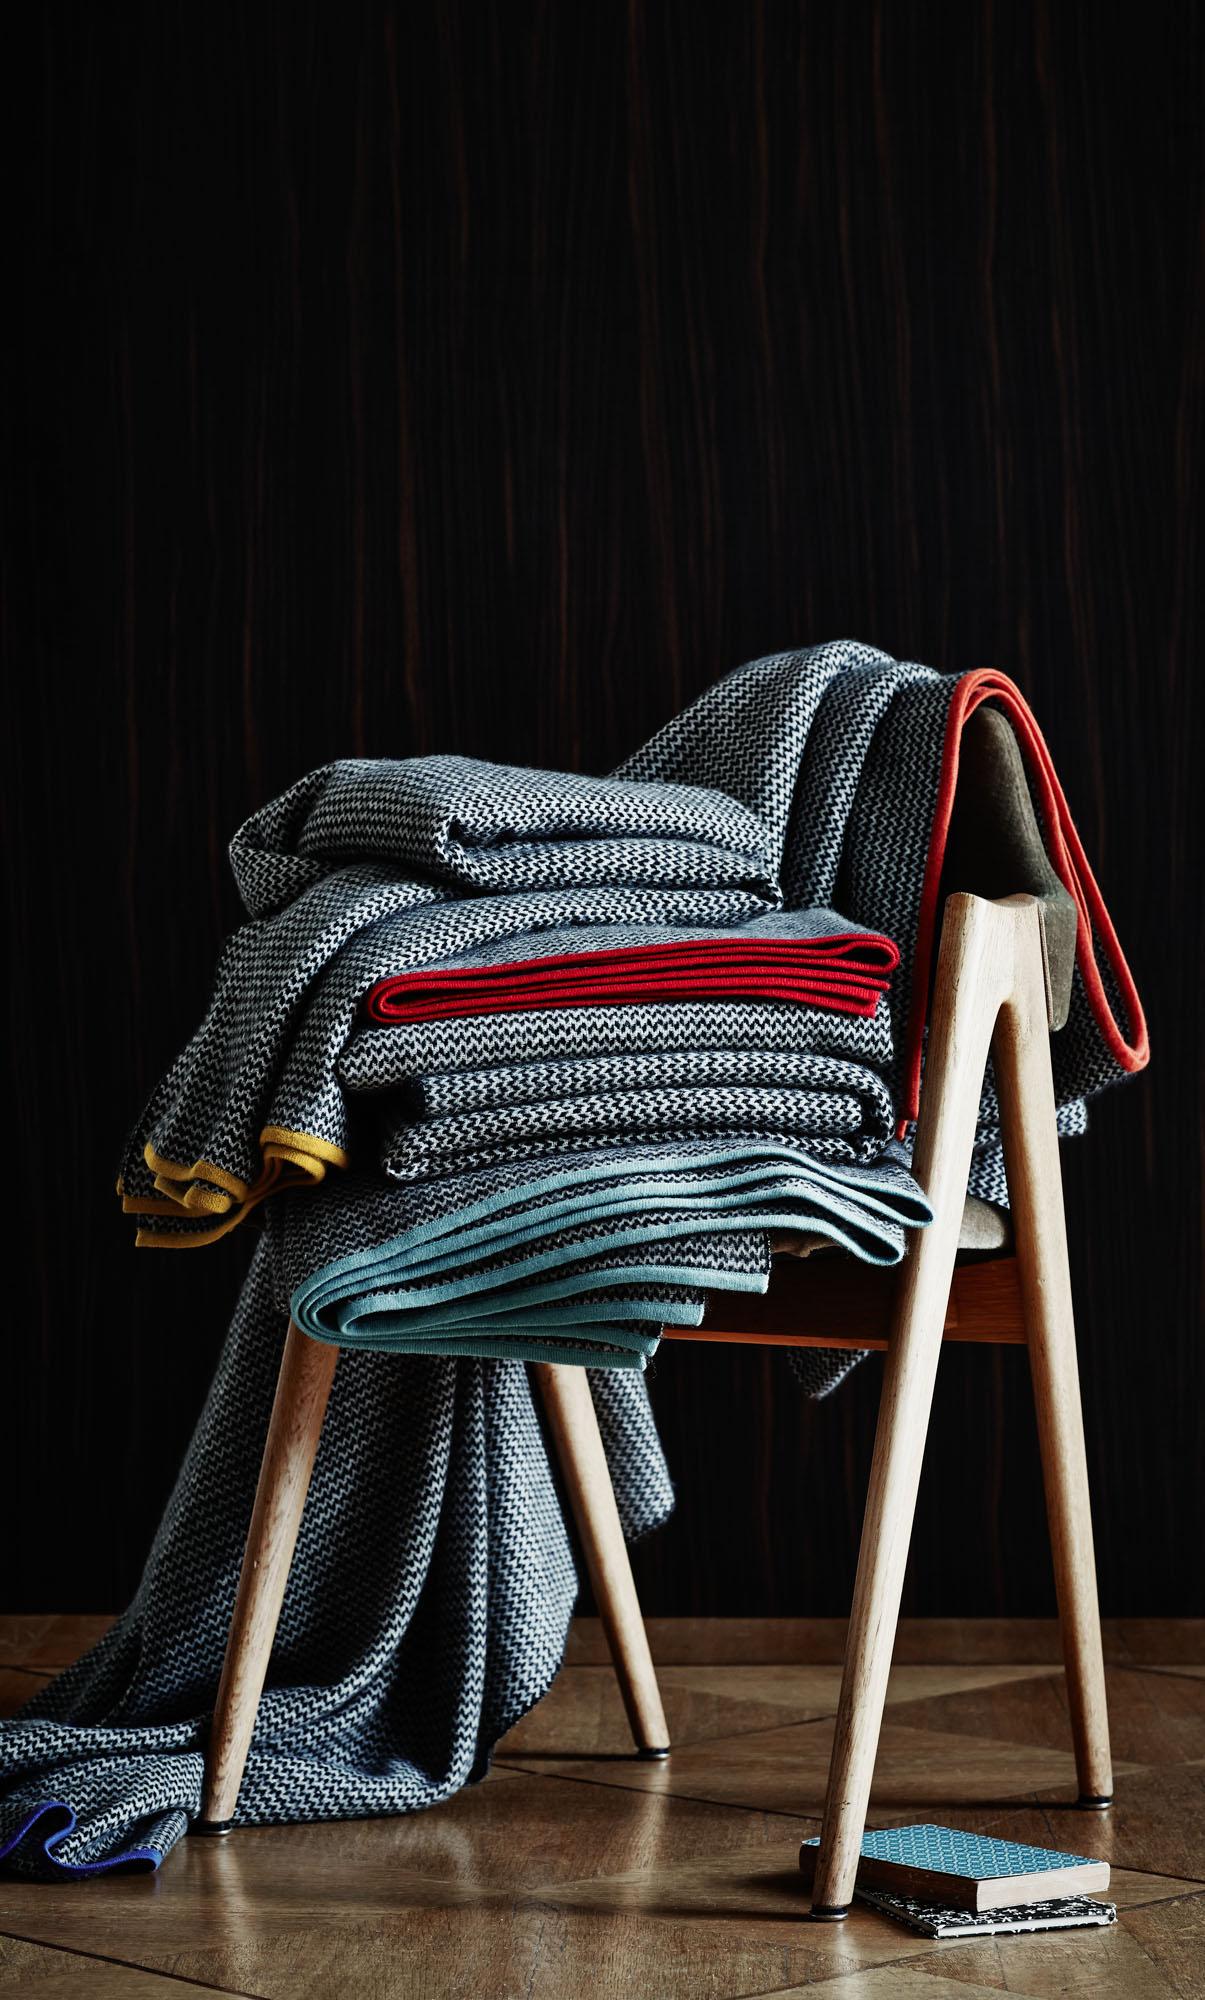 cashmere blankets 26.09.14 0429_RGB.jpg